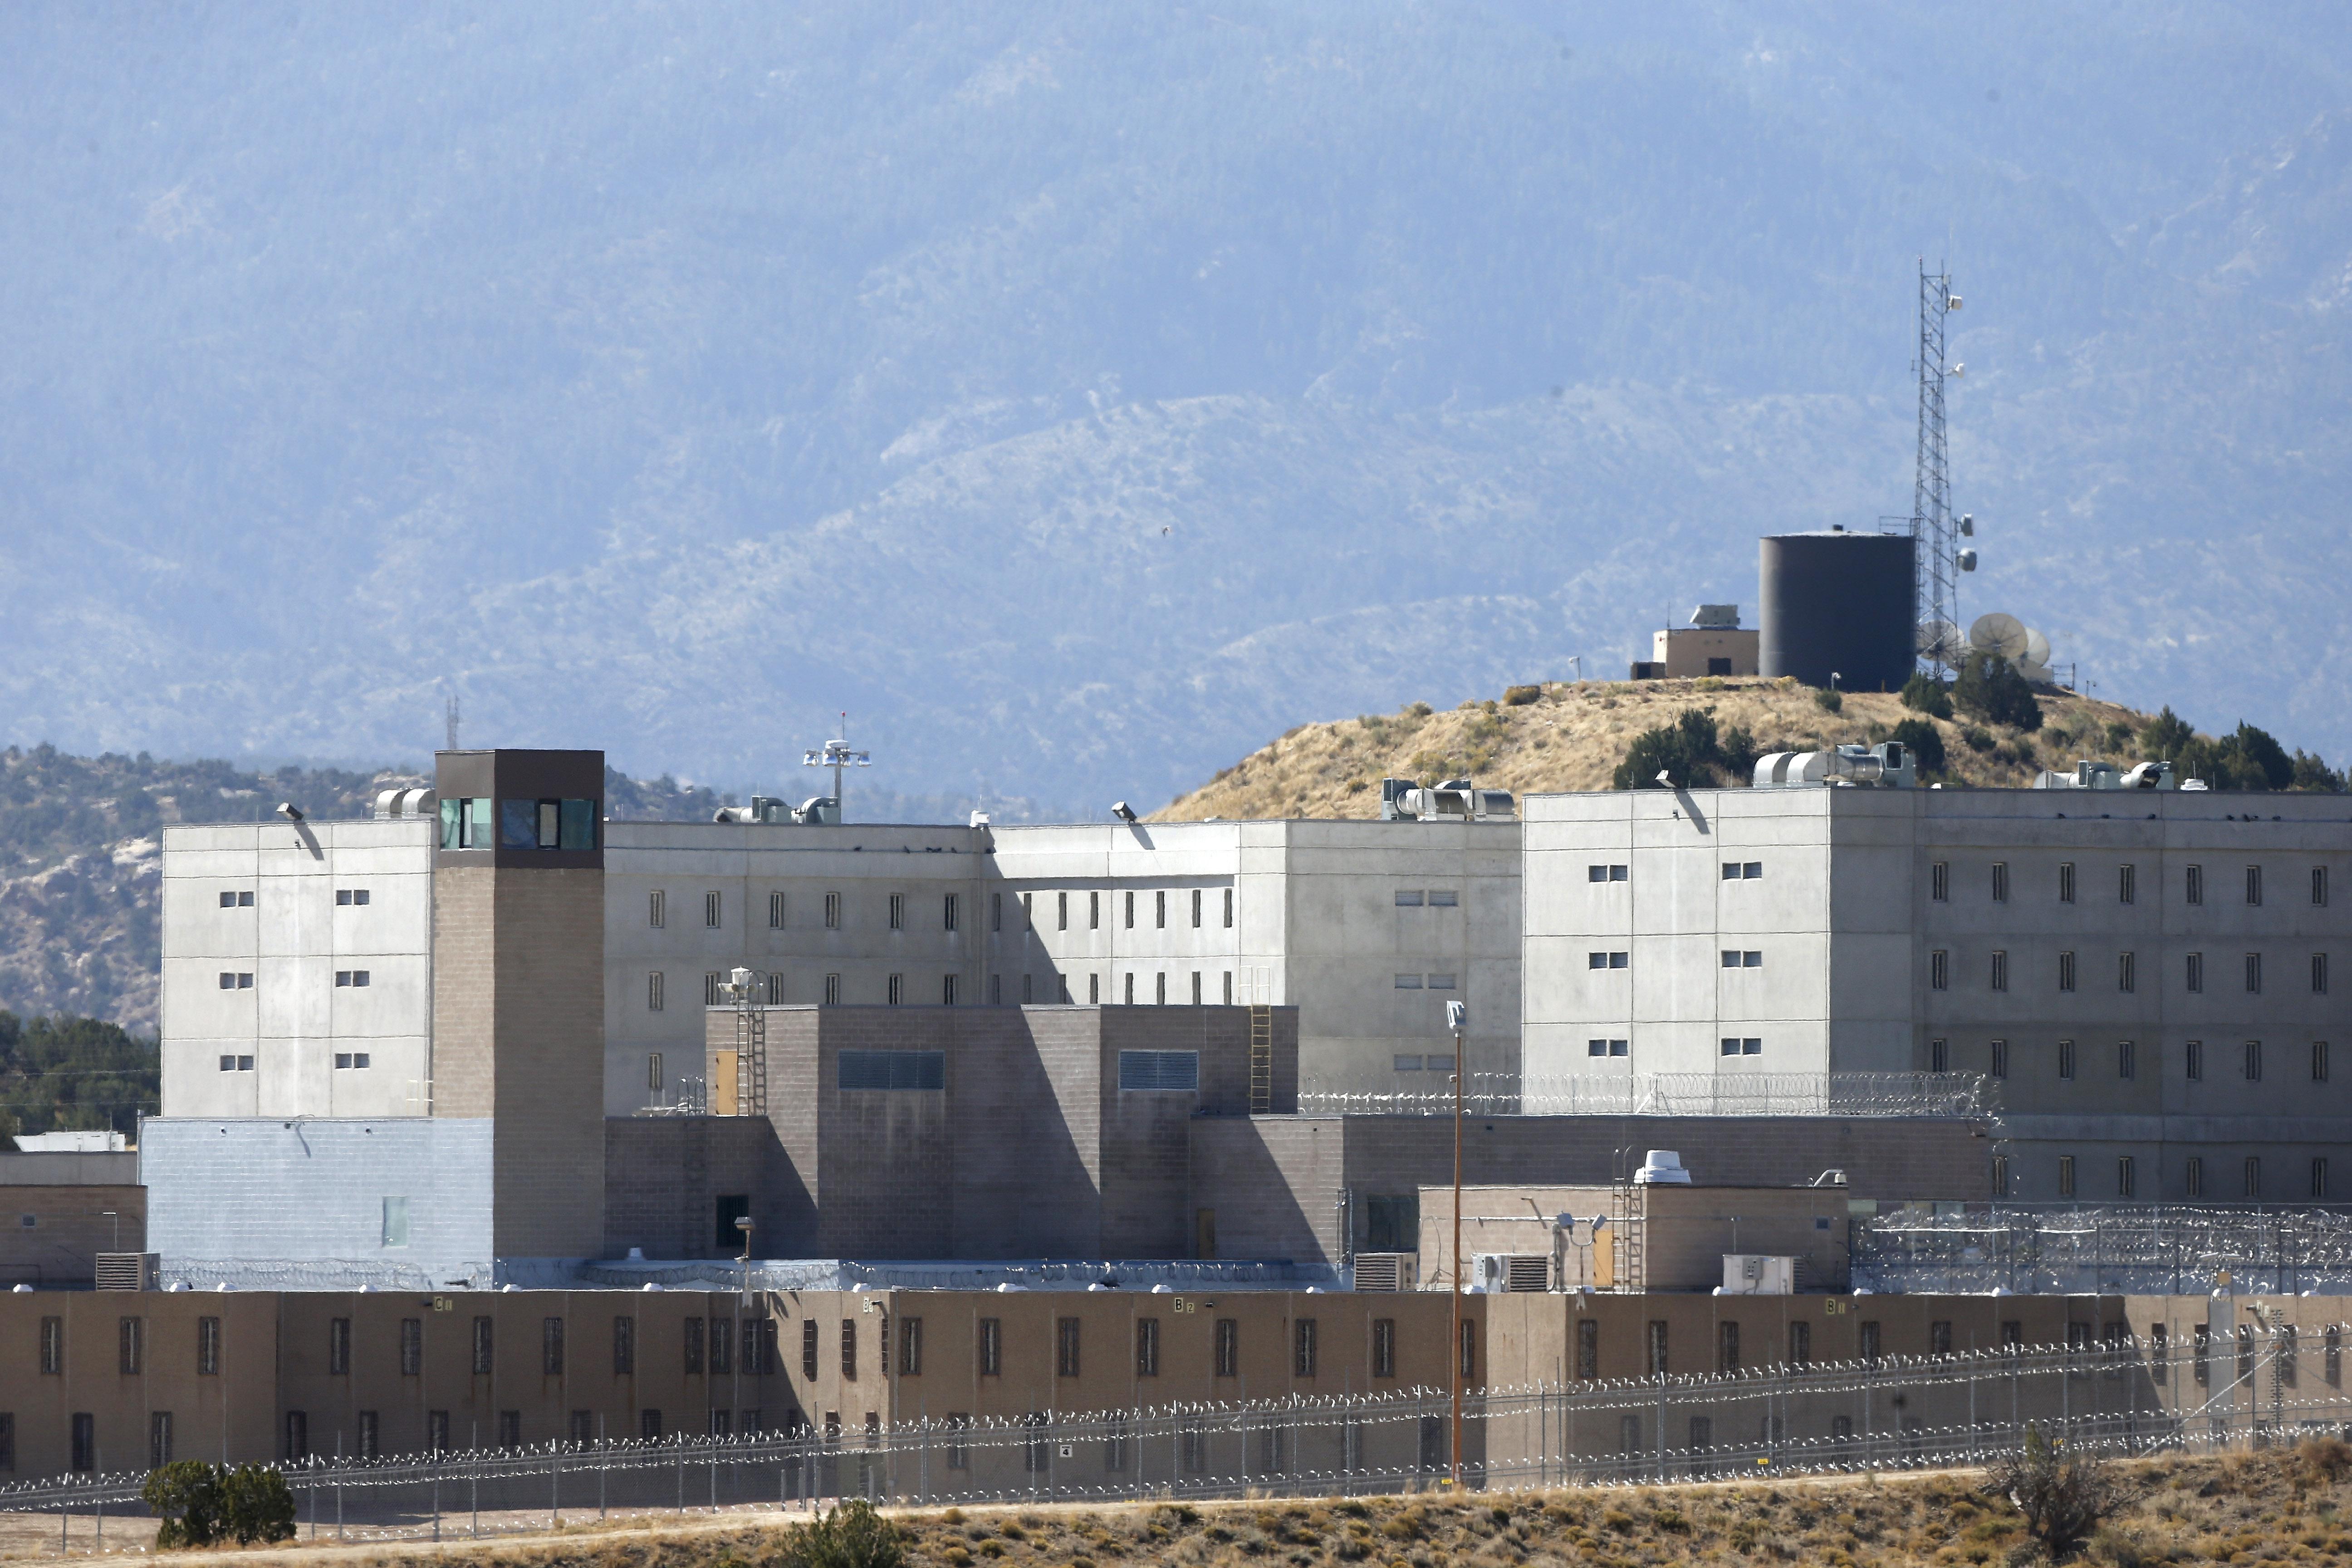 Photo: Colorado State Penitentiary II (AP file)